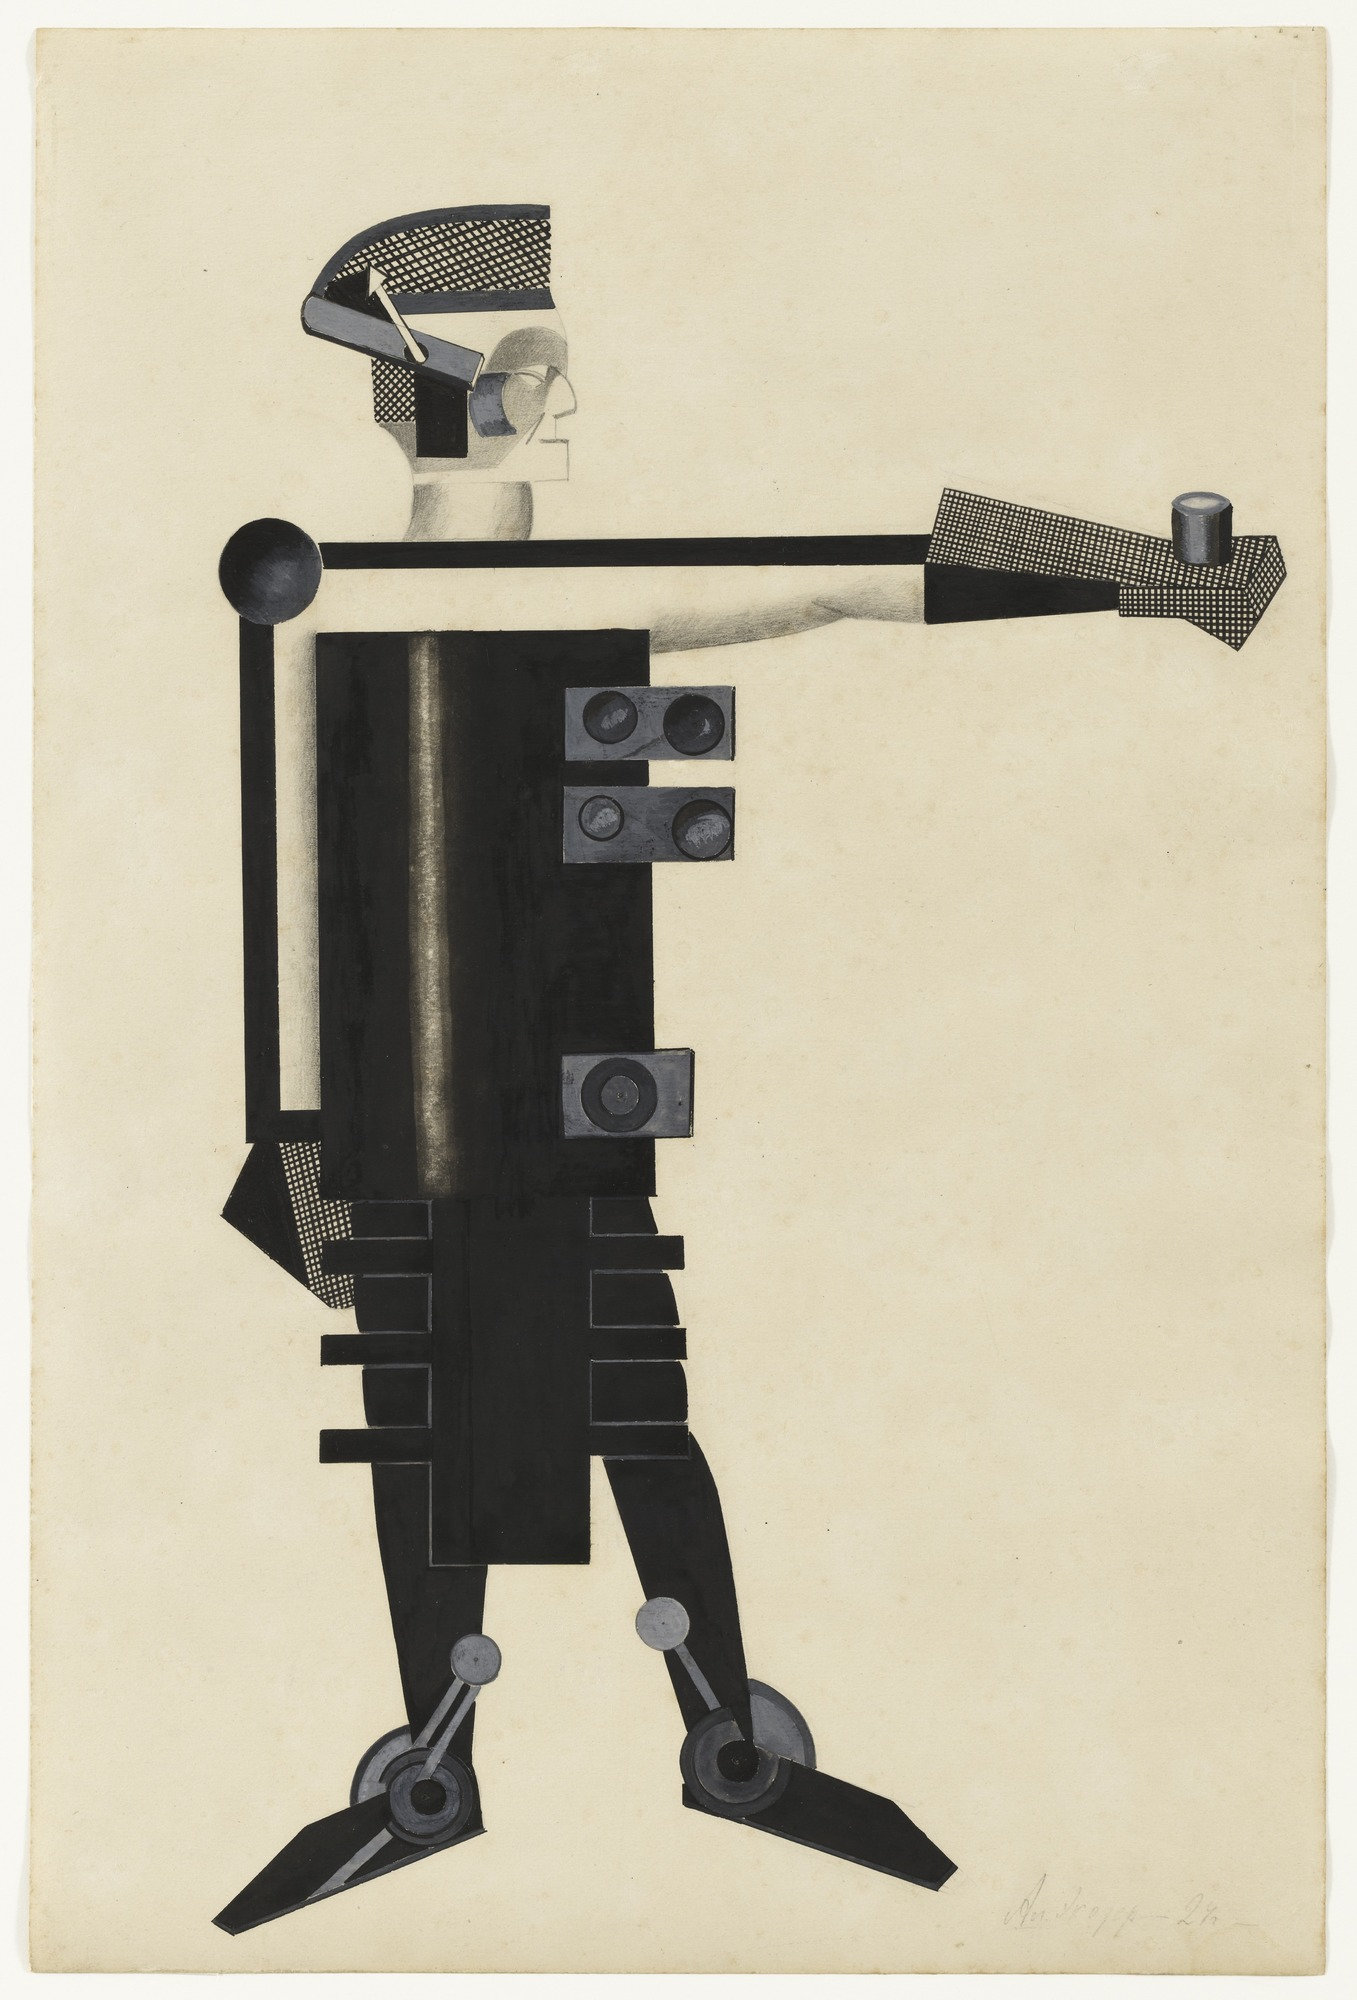 alexandra-exter-guardian-of-energy-costume-design-for-the-film-aelita-by-yakov-protozanov-1924.jpeg